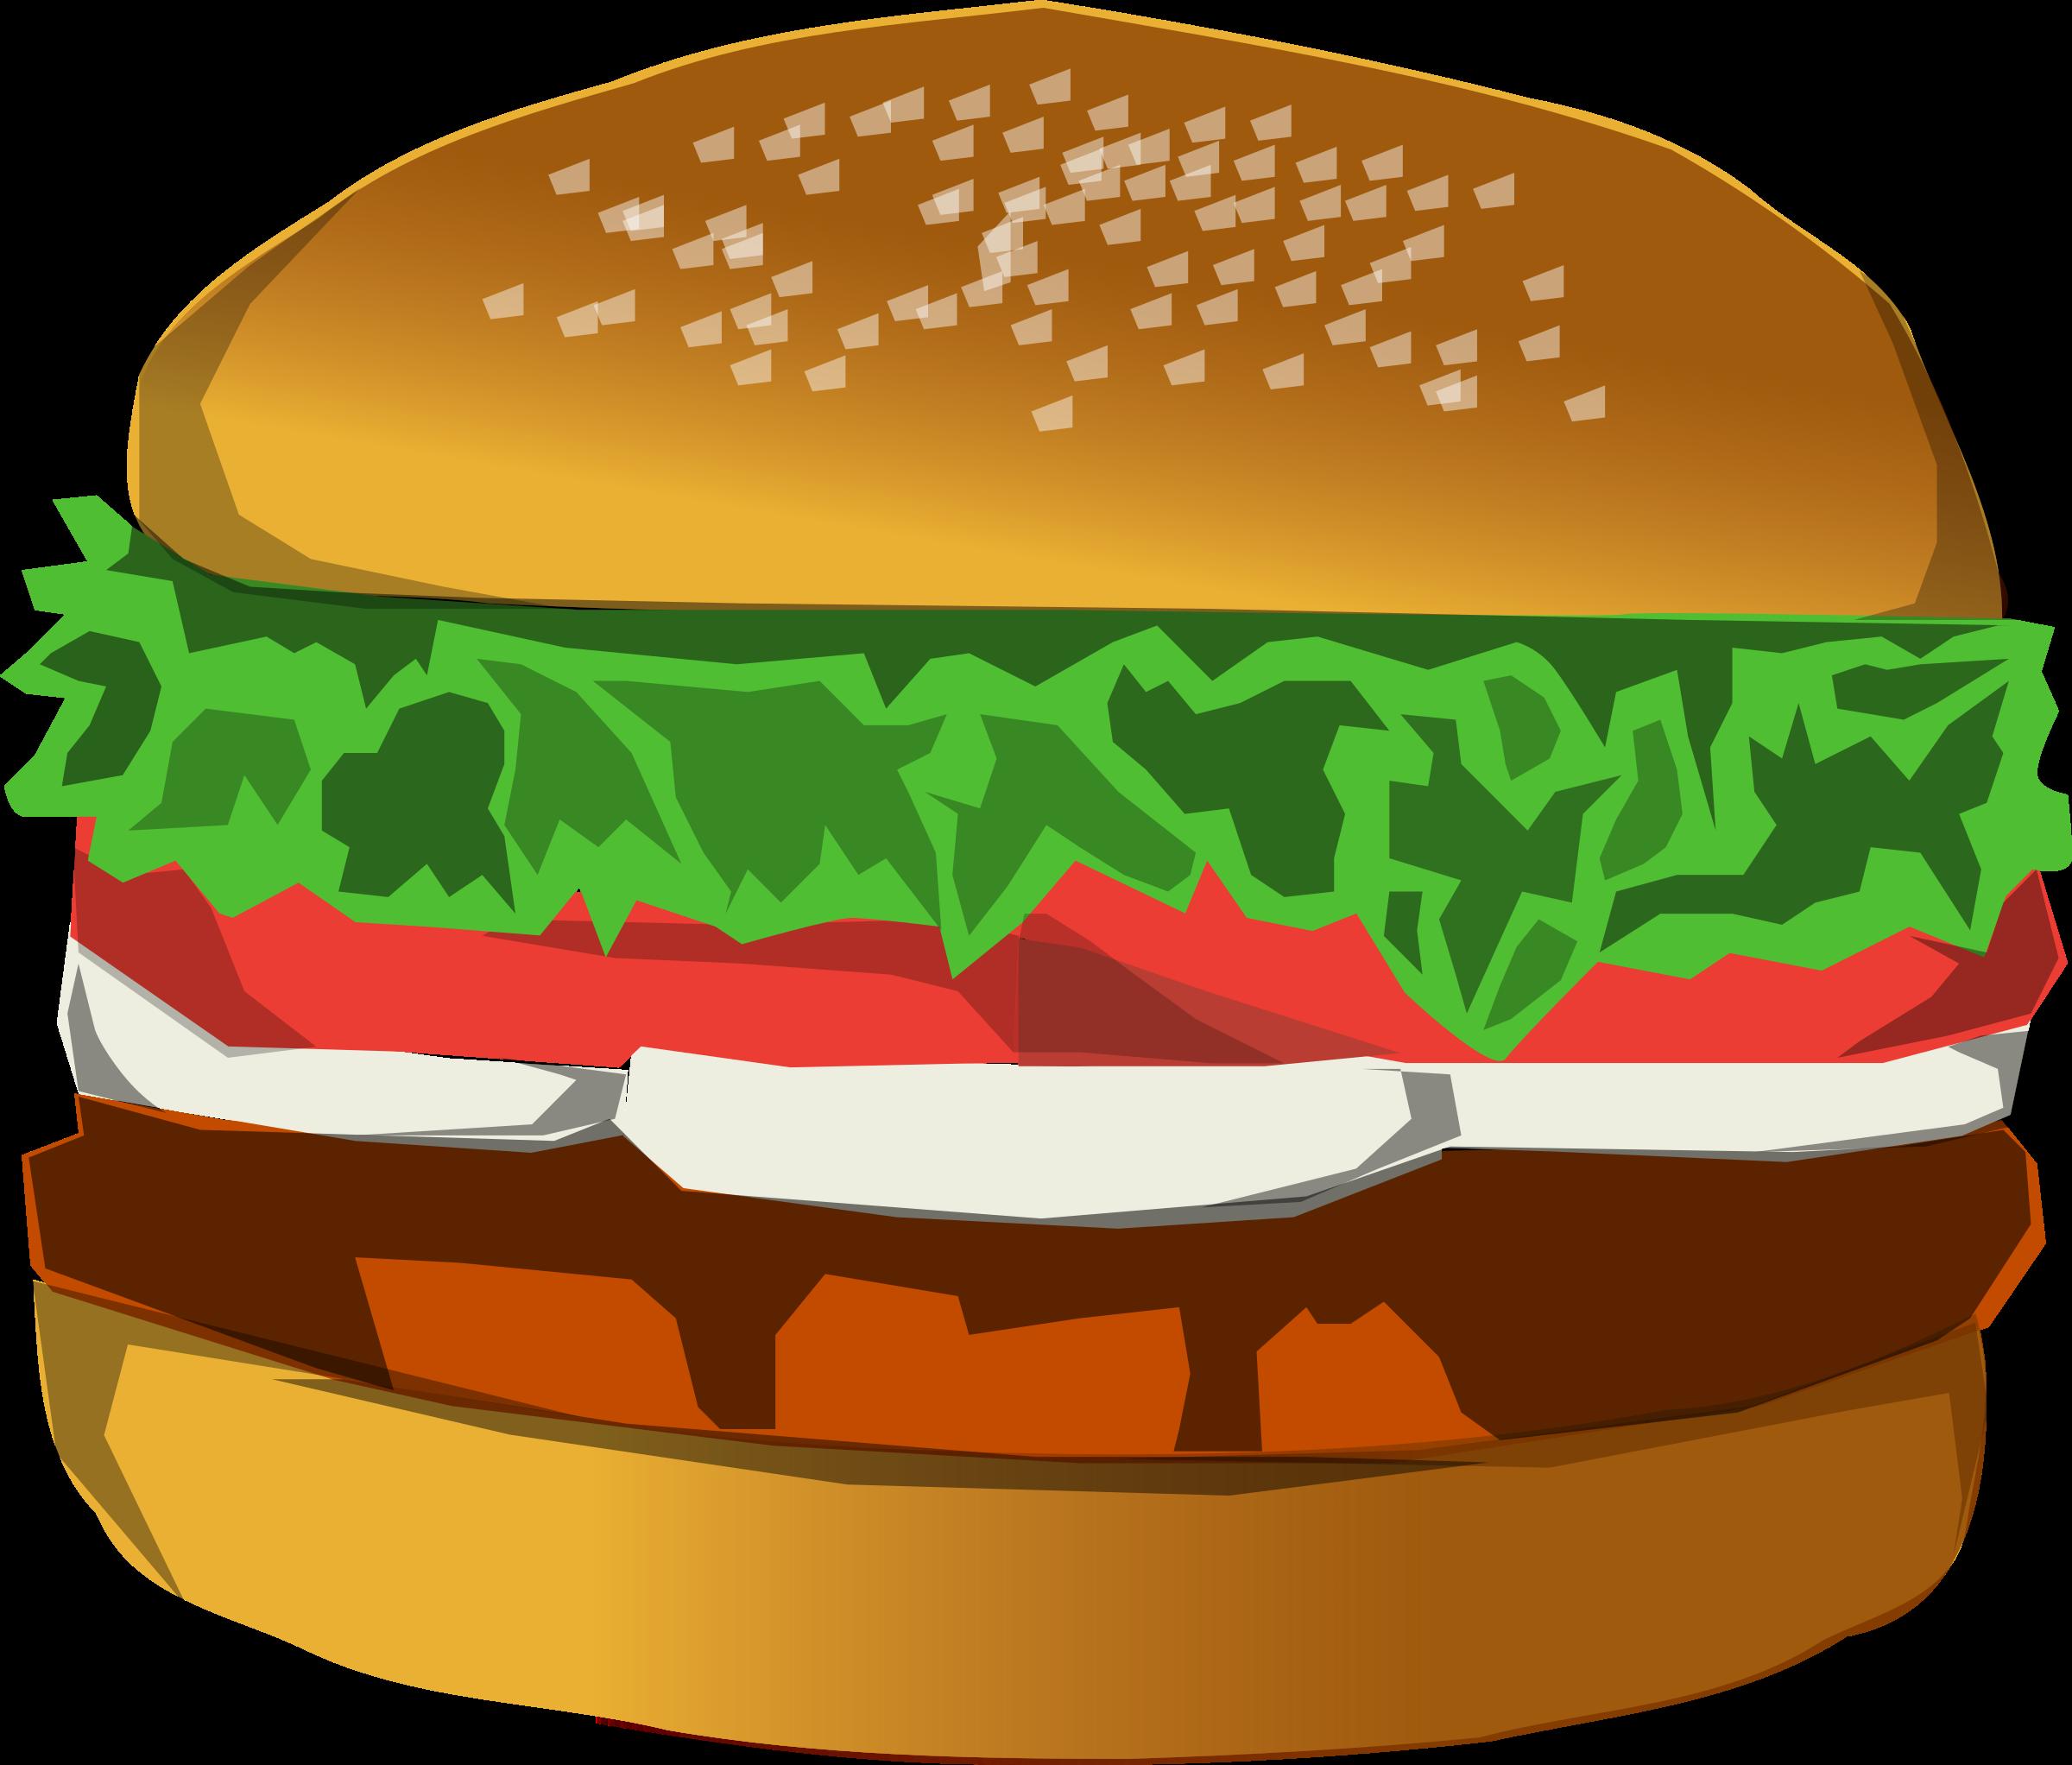 picture transparent library Big image png. Hamburger clipart regular burger